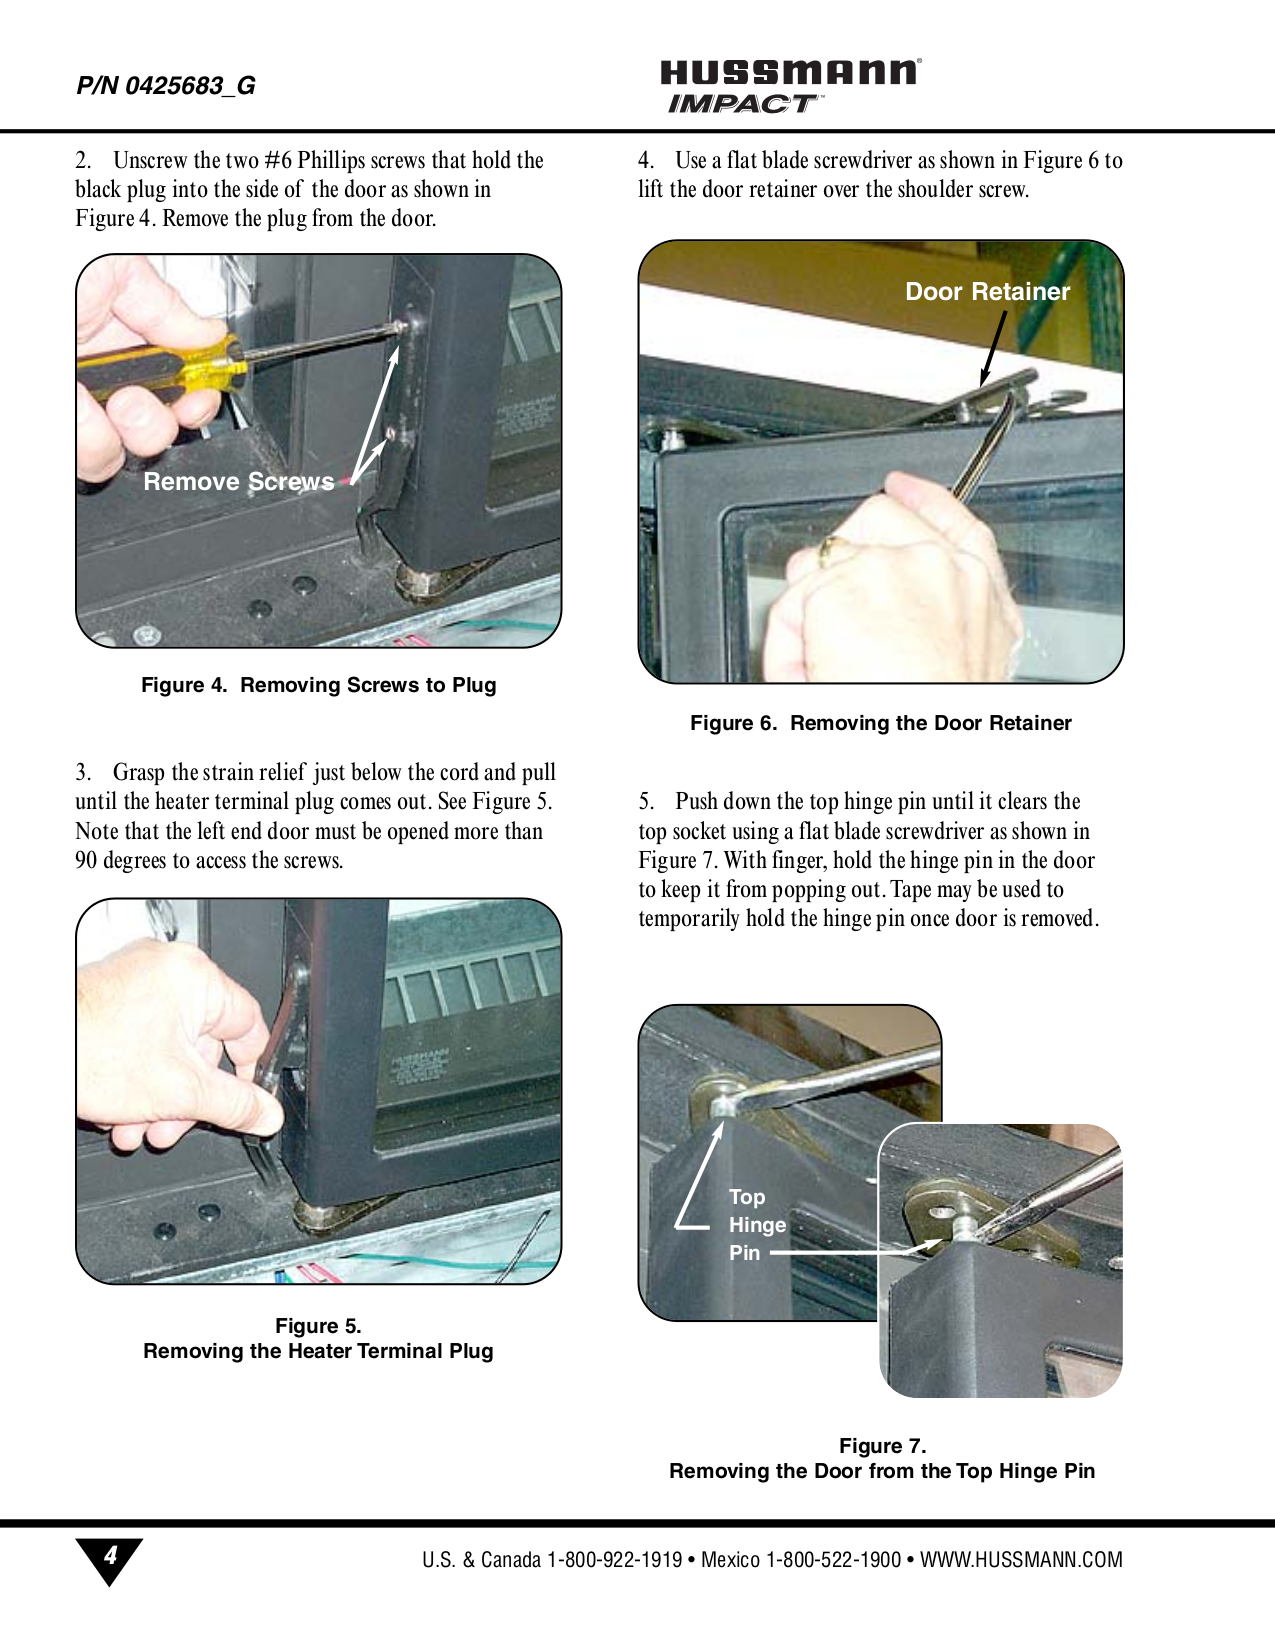 Hussmann RLN 5.pdf 7 hussmann rln 5 manual wiring diagrams wiring diagrams hussmann rl5 wiring diagram at gsmx.co